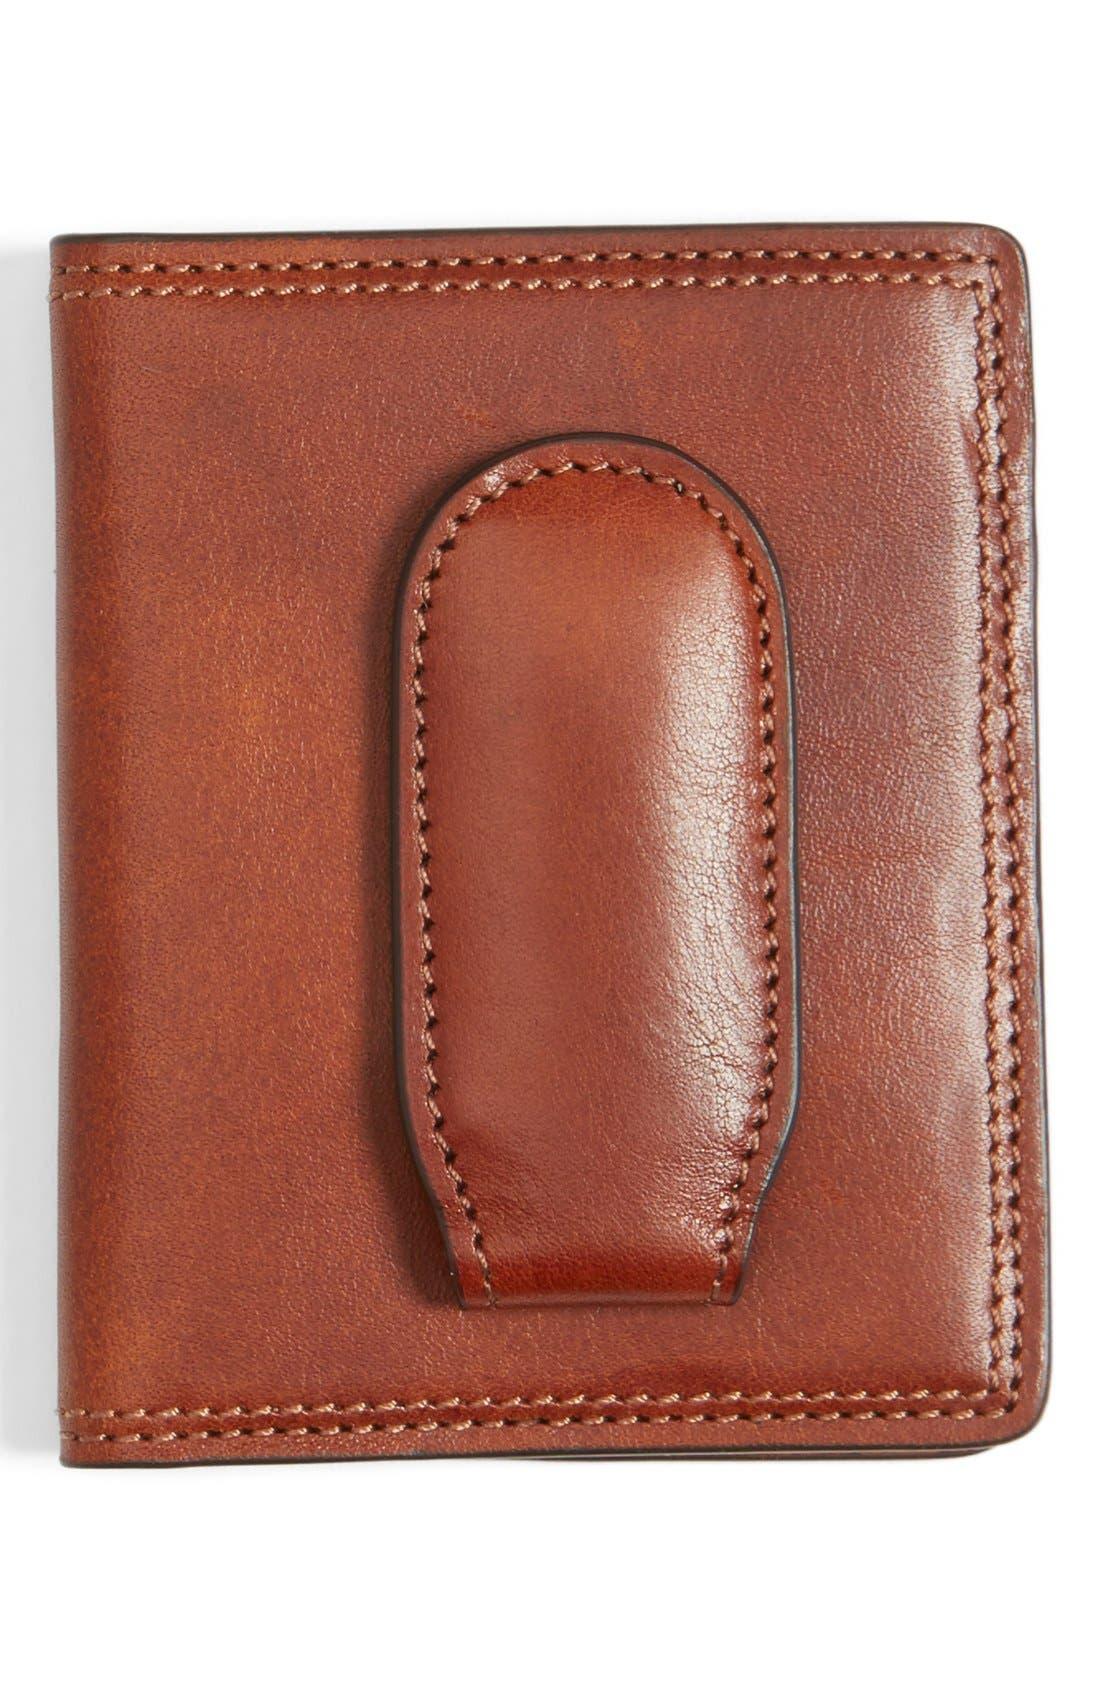 Leather Front Pocket Money Clip Wallet,                         Main,                         color, Amber